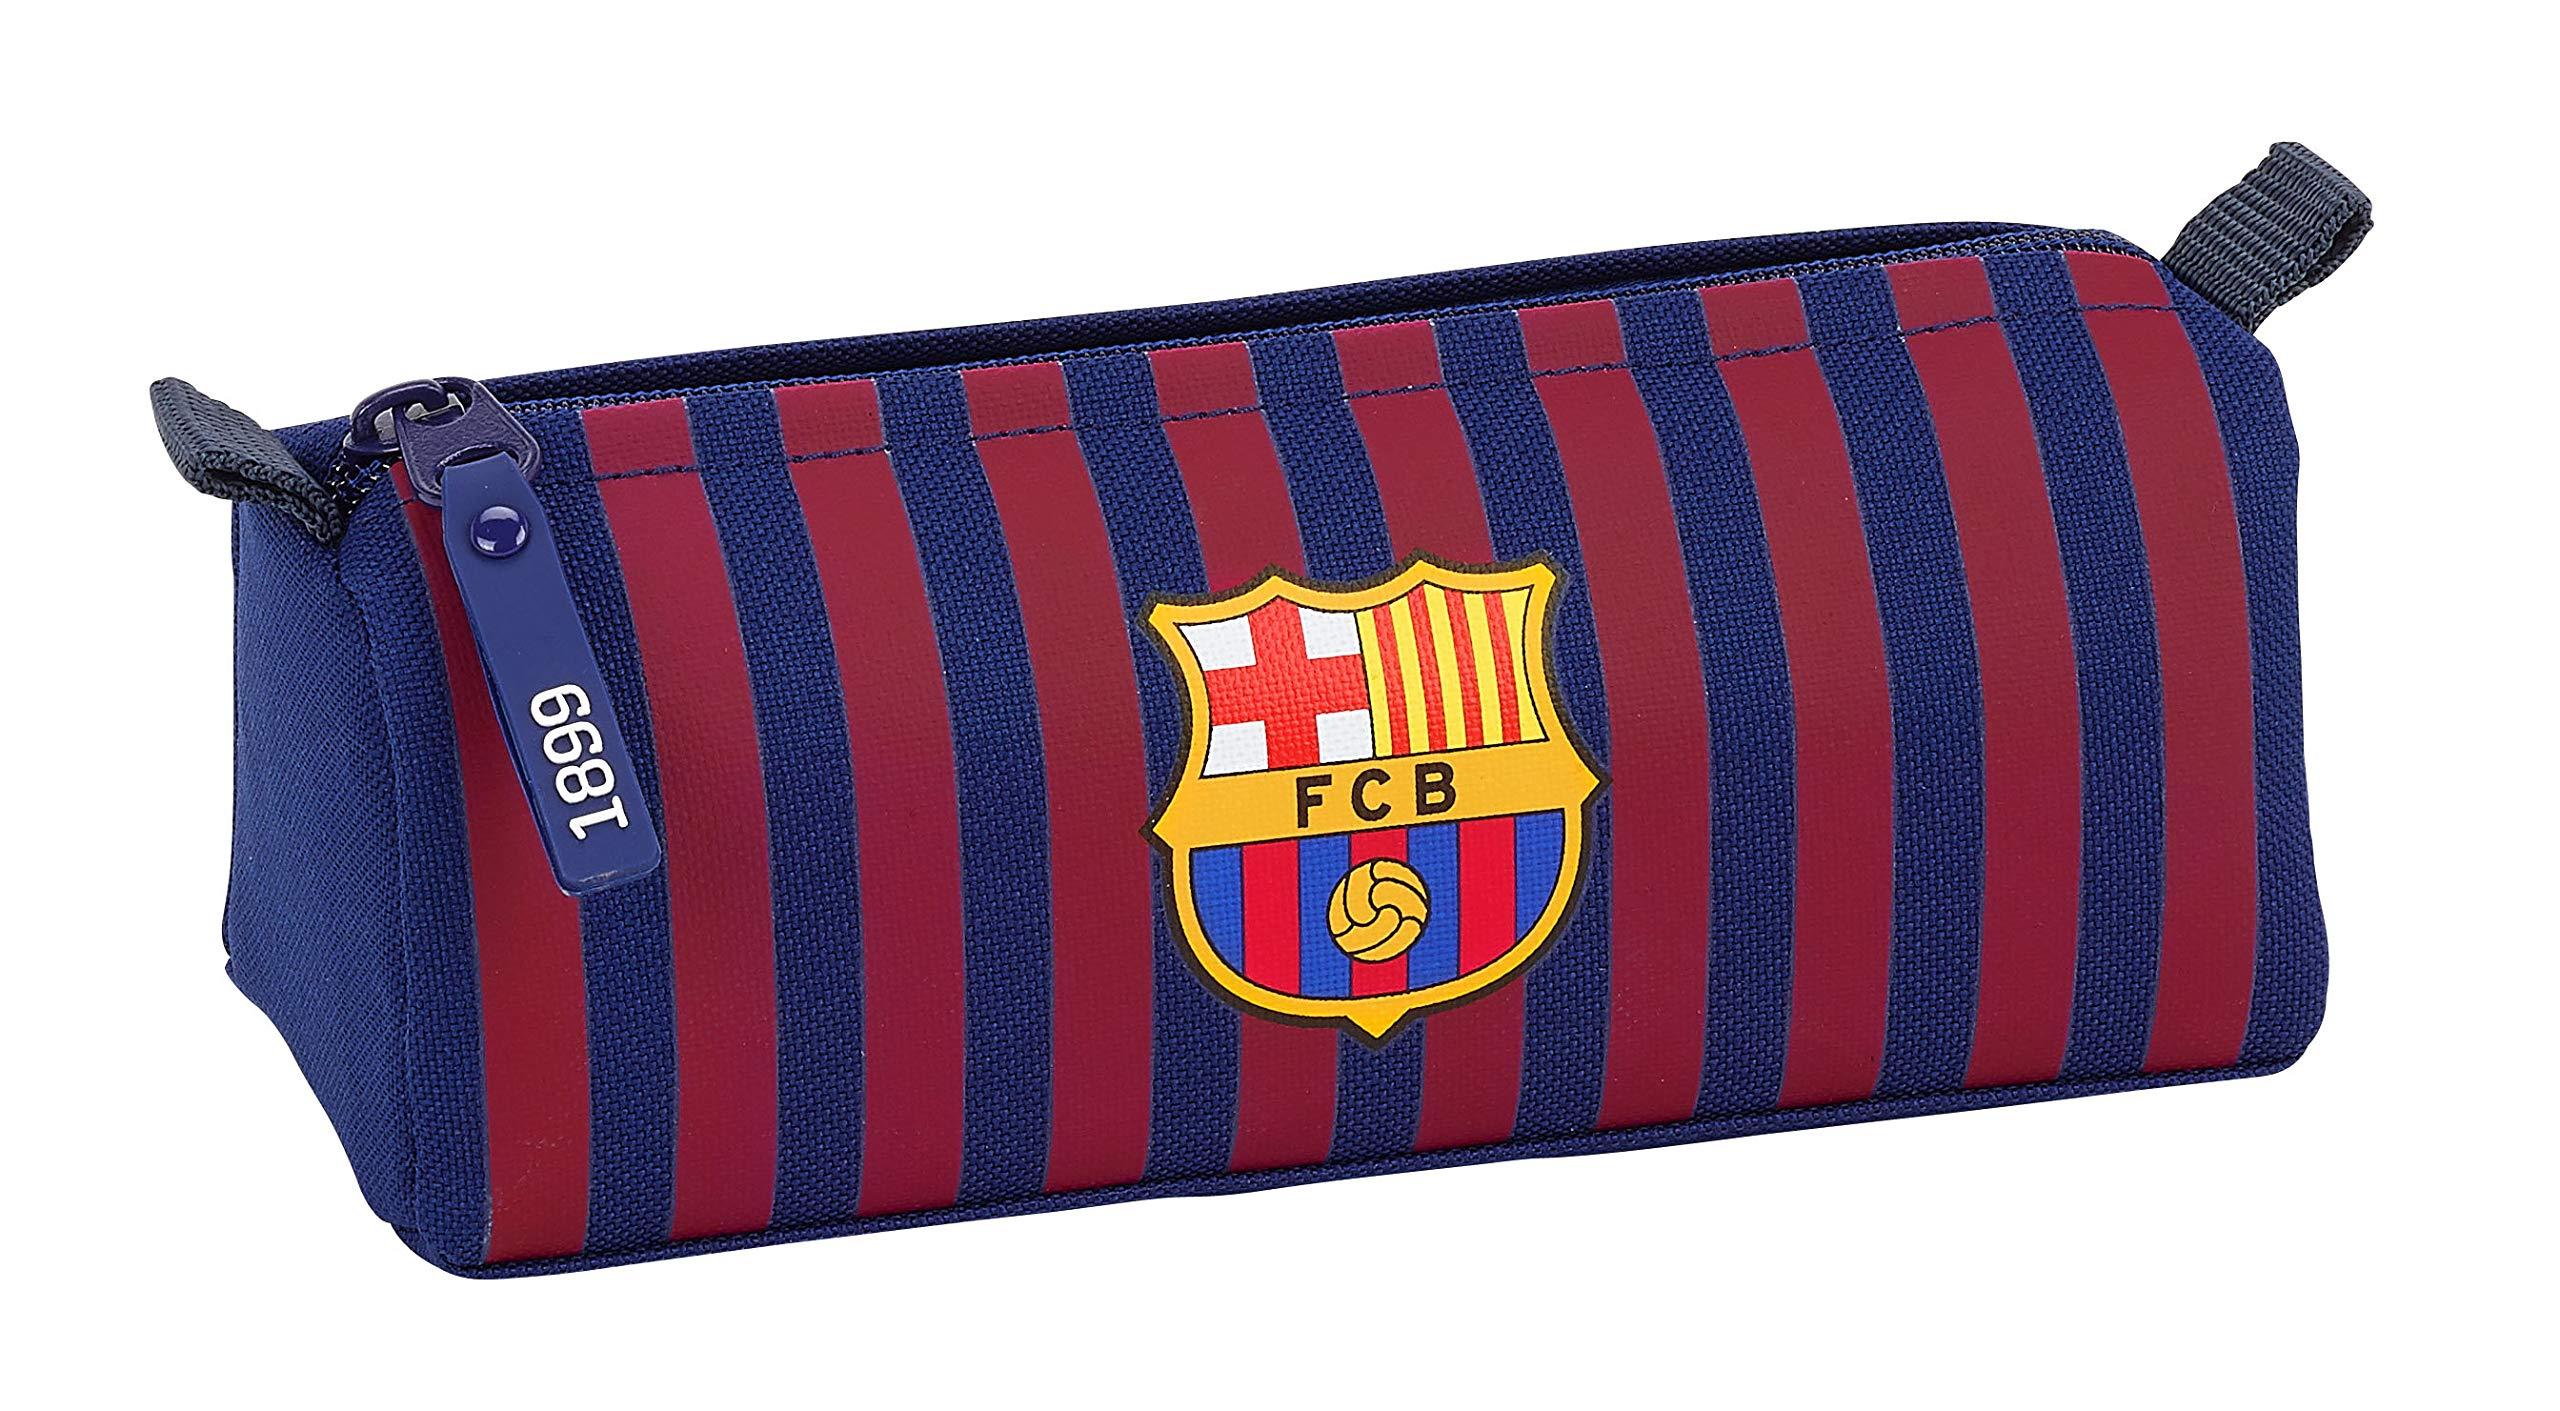 FC Barcelona 811829742 2018 Estuches, 21 cm, Azul